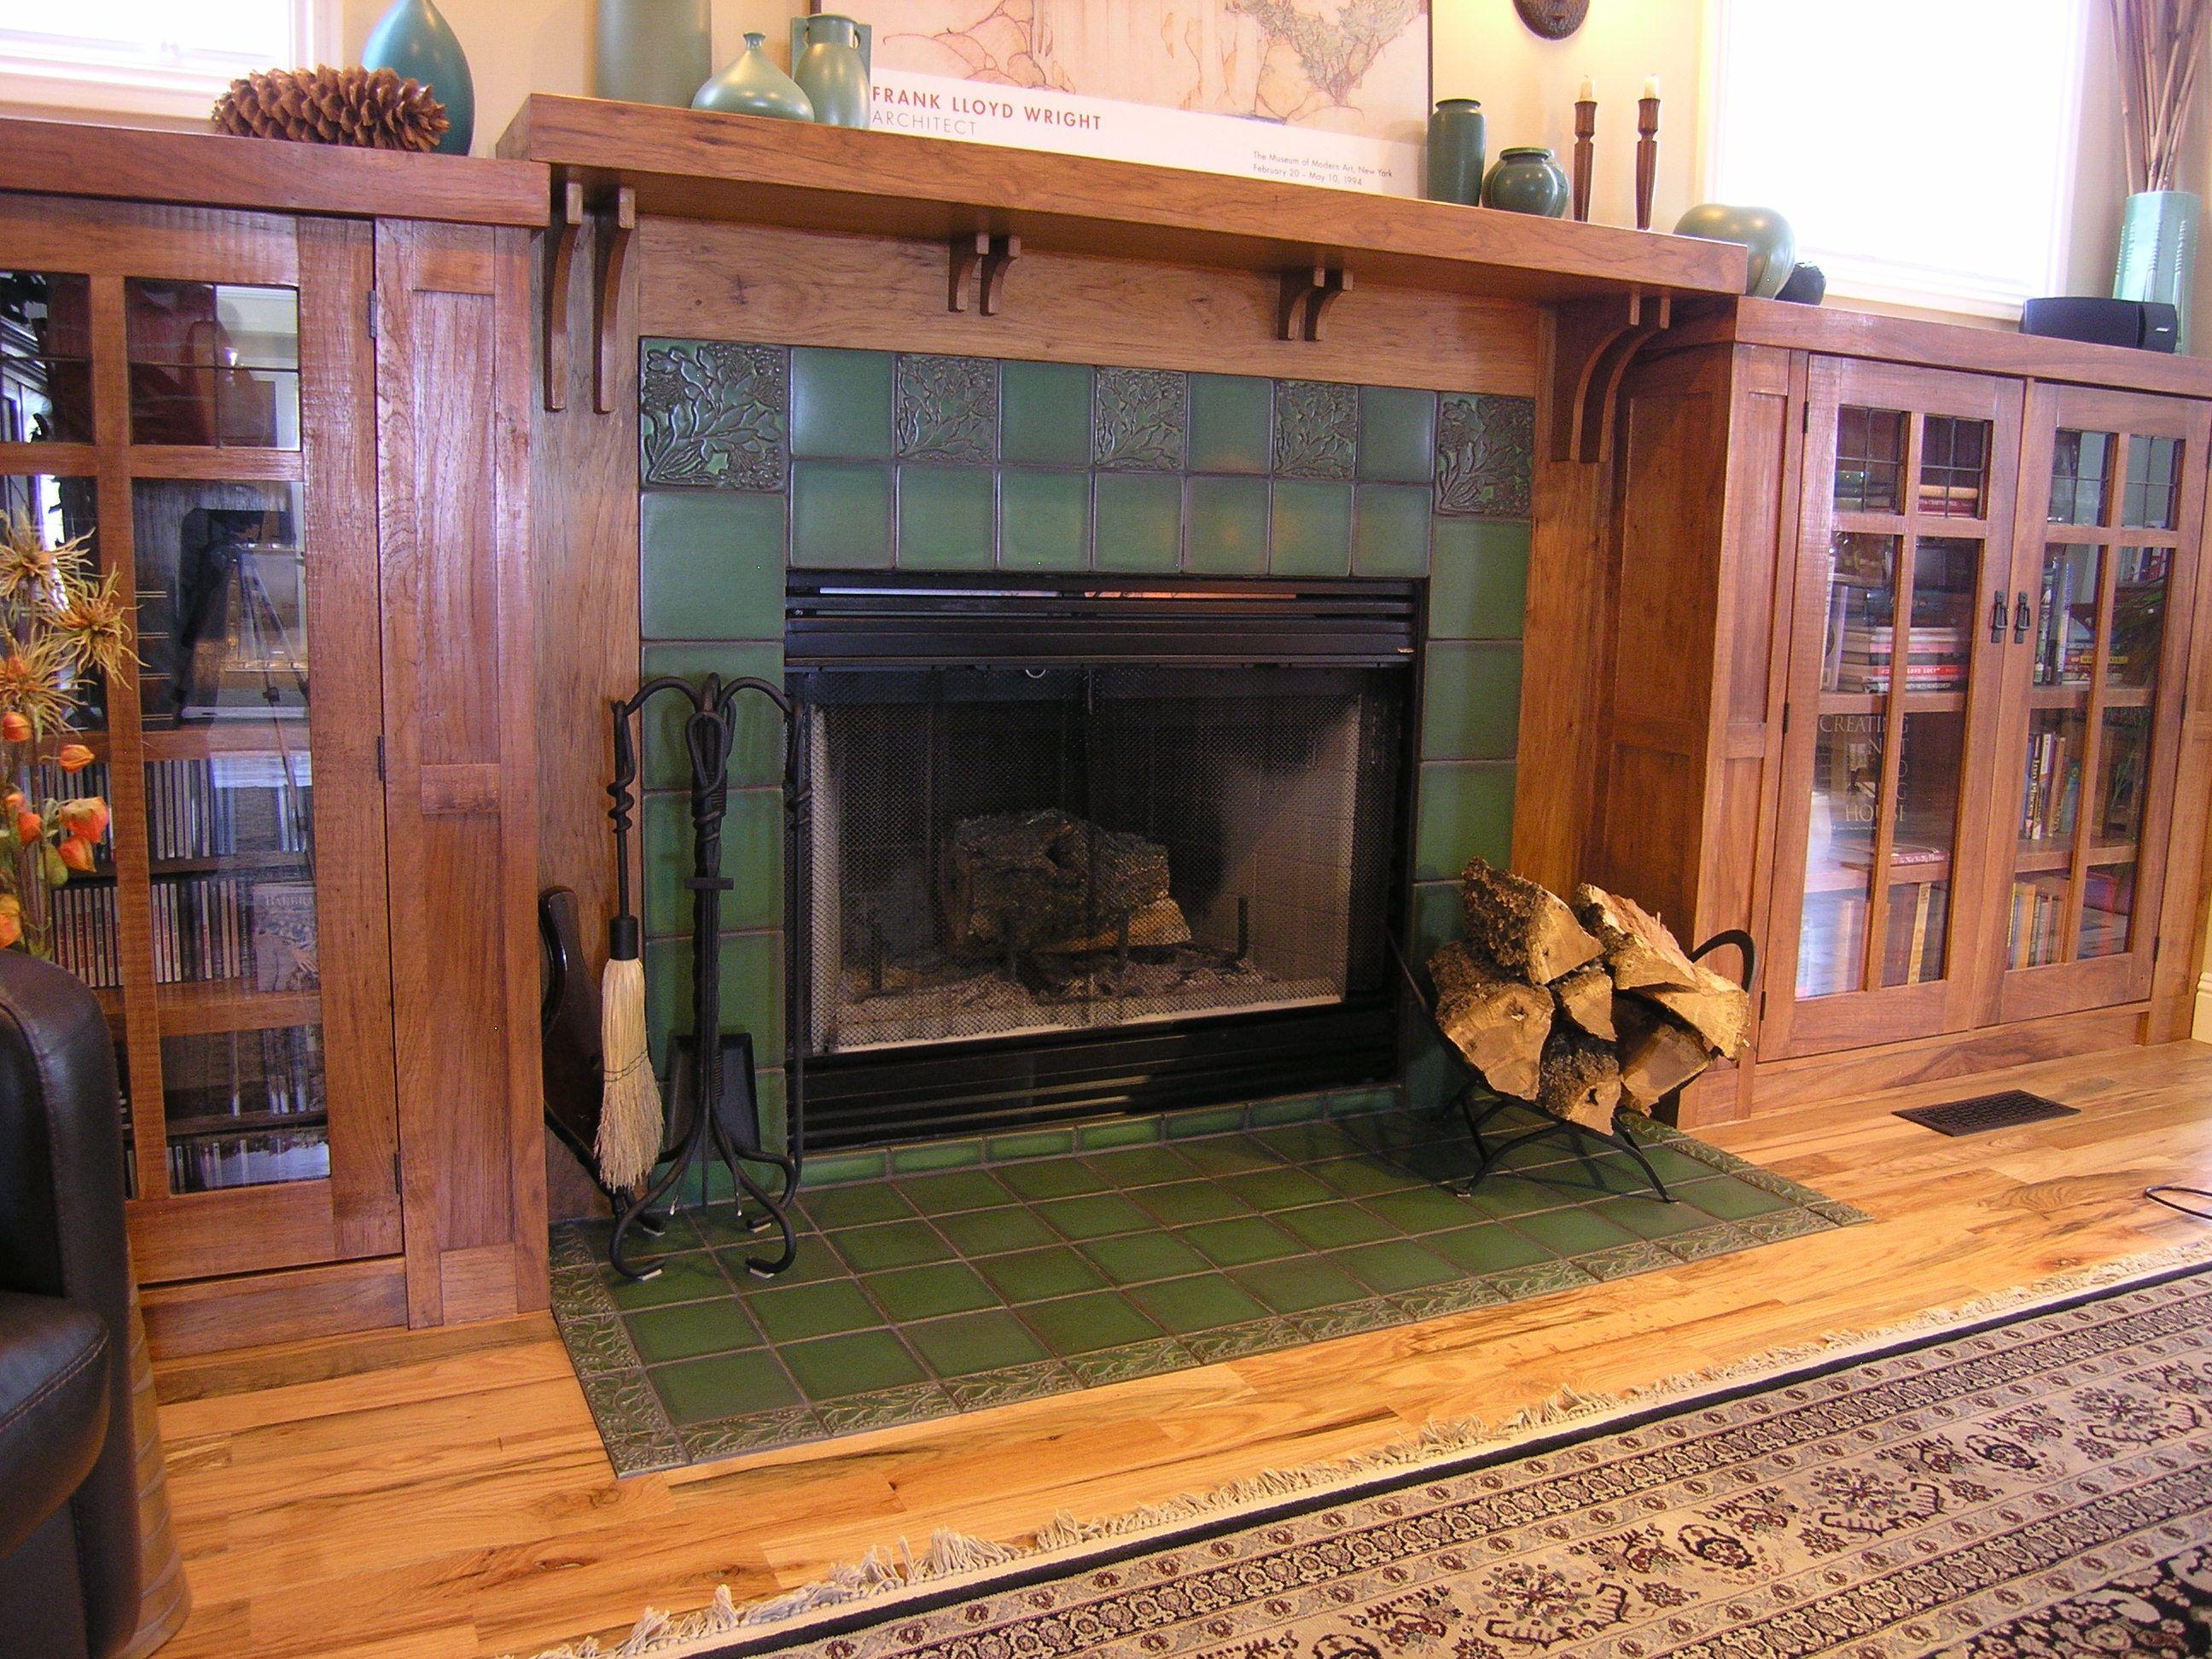 Motawi Leaves & Berries Fireplace in Lee Green glaze # ...